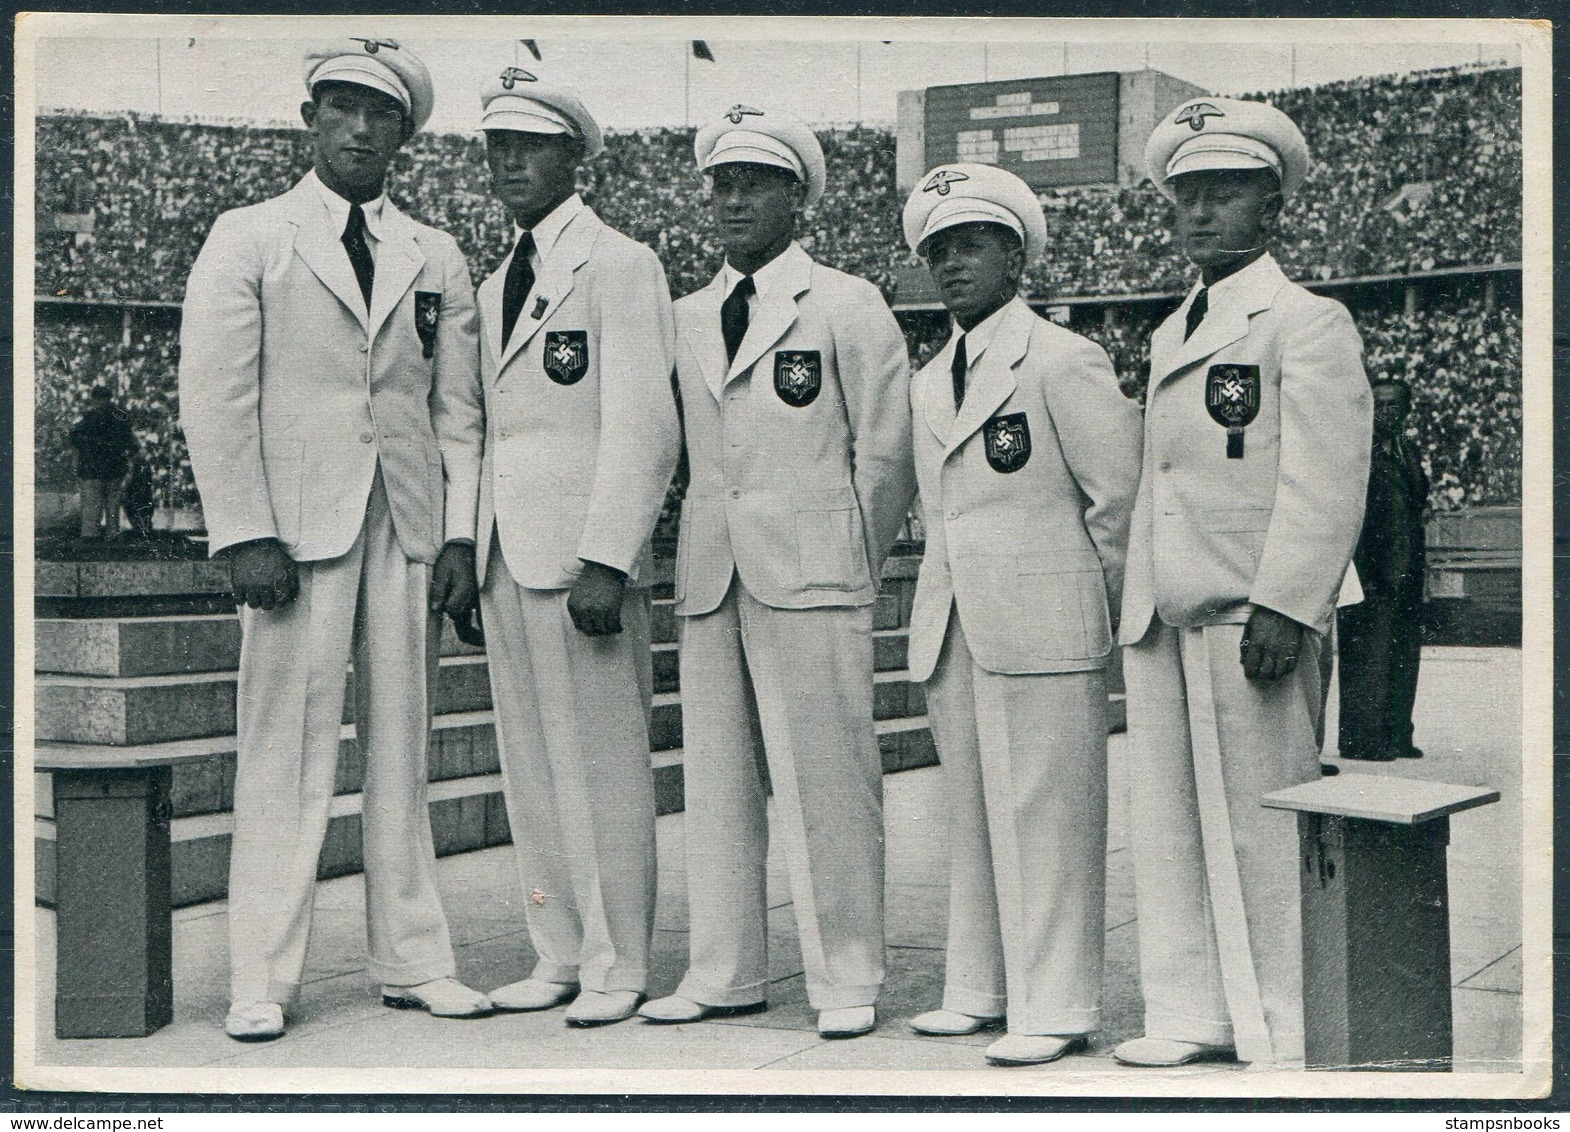 1936 Germany Berlin Olympics Olympia Sammelwerk 14 Bild 129 Gruppe 58 Boxing German Team. Runge Murach Vogt Miner Kaiser - Trading Cards